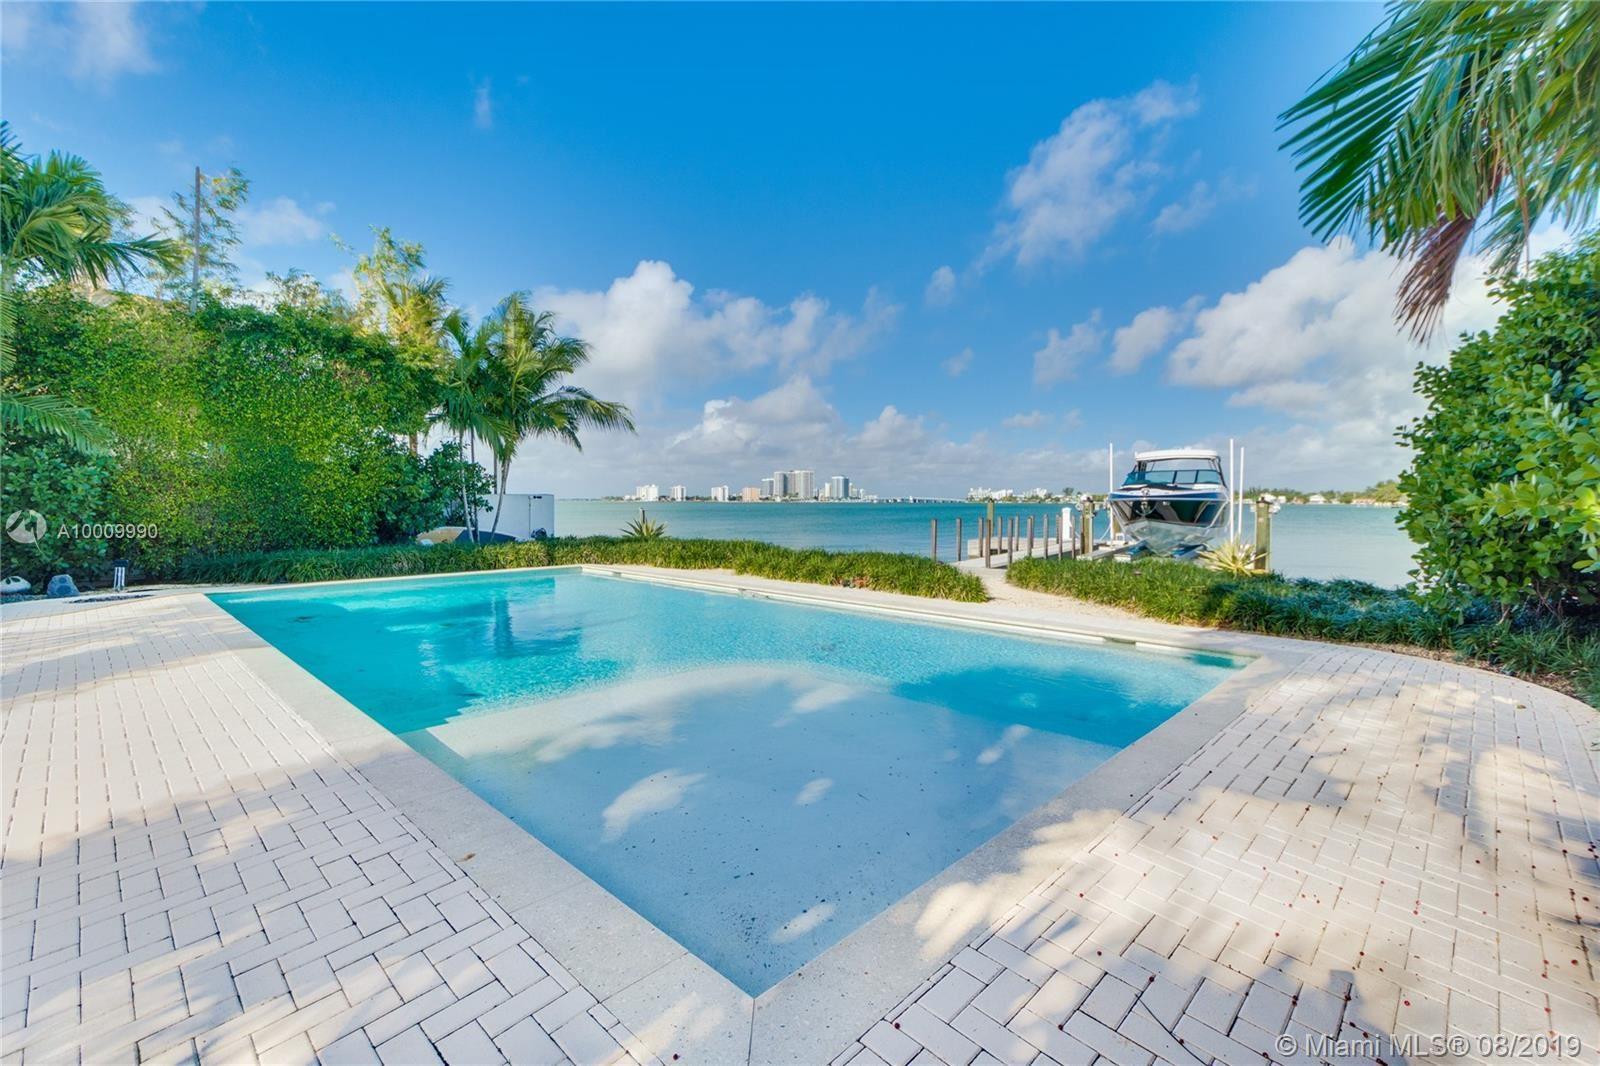 Photo 33 of Listing MLS a10009990 in 6050 N Bay Rd Miami Beach FL 33140